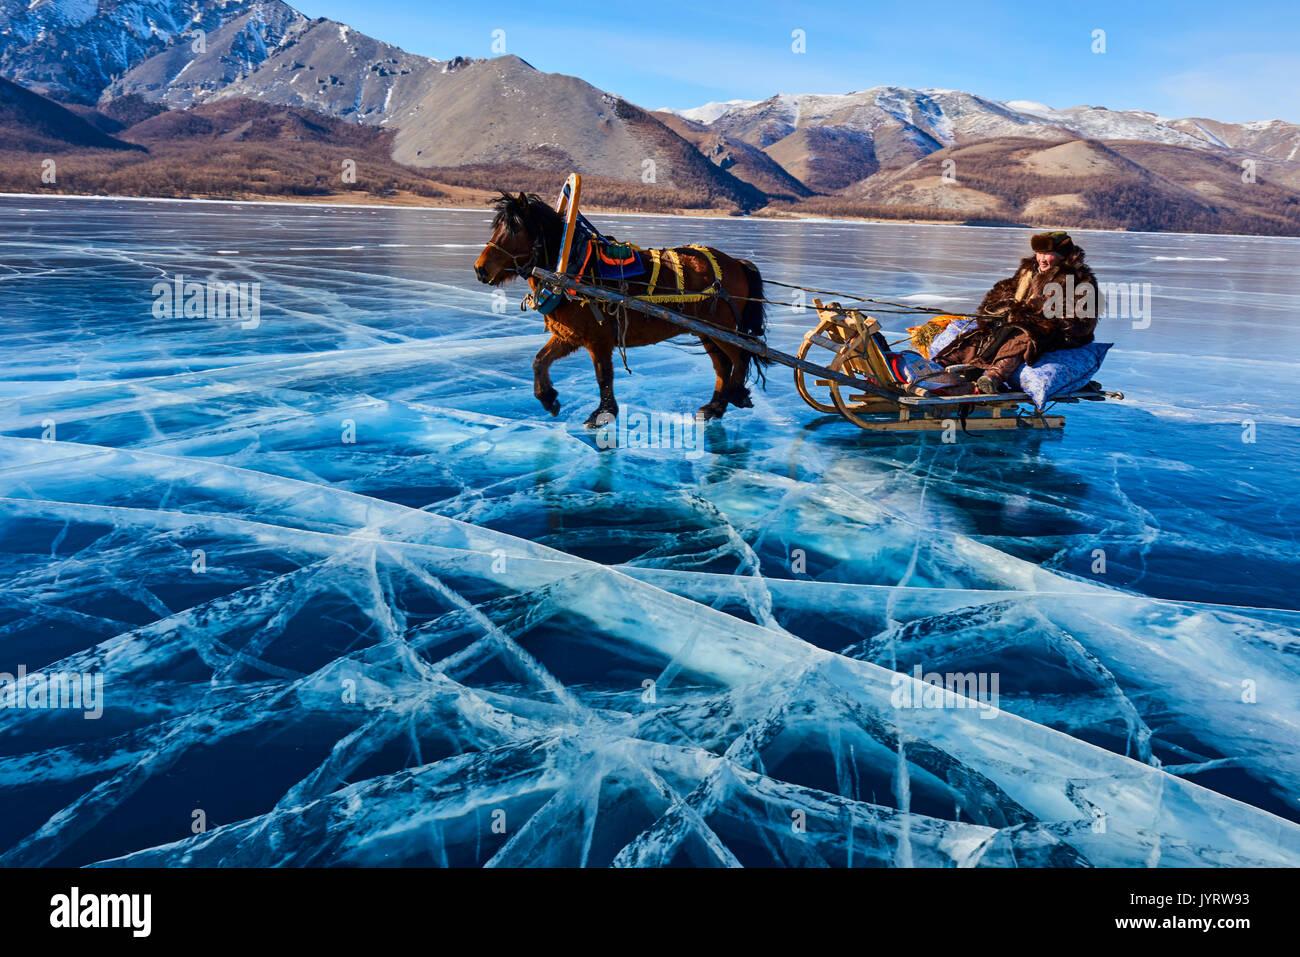 Mongolia, Khovsgol province, horse sled on the frozen lake of Khovsgol in winter - Stock Image